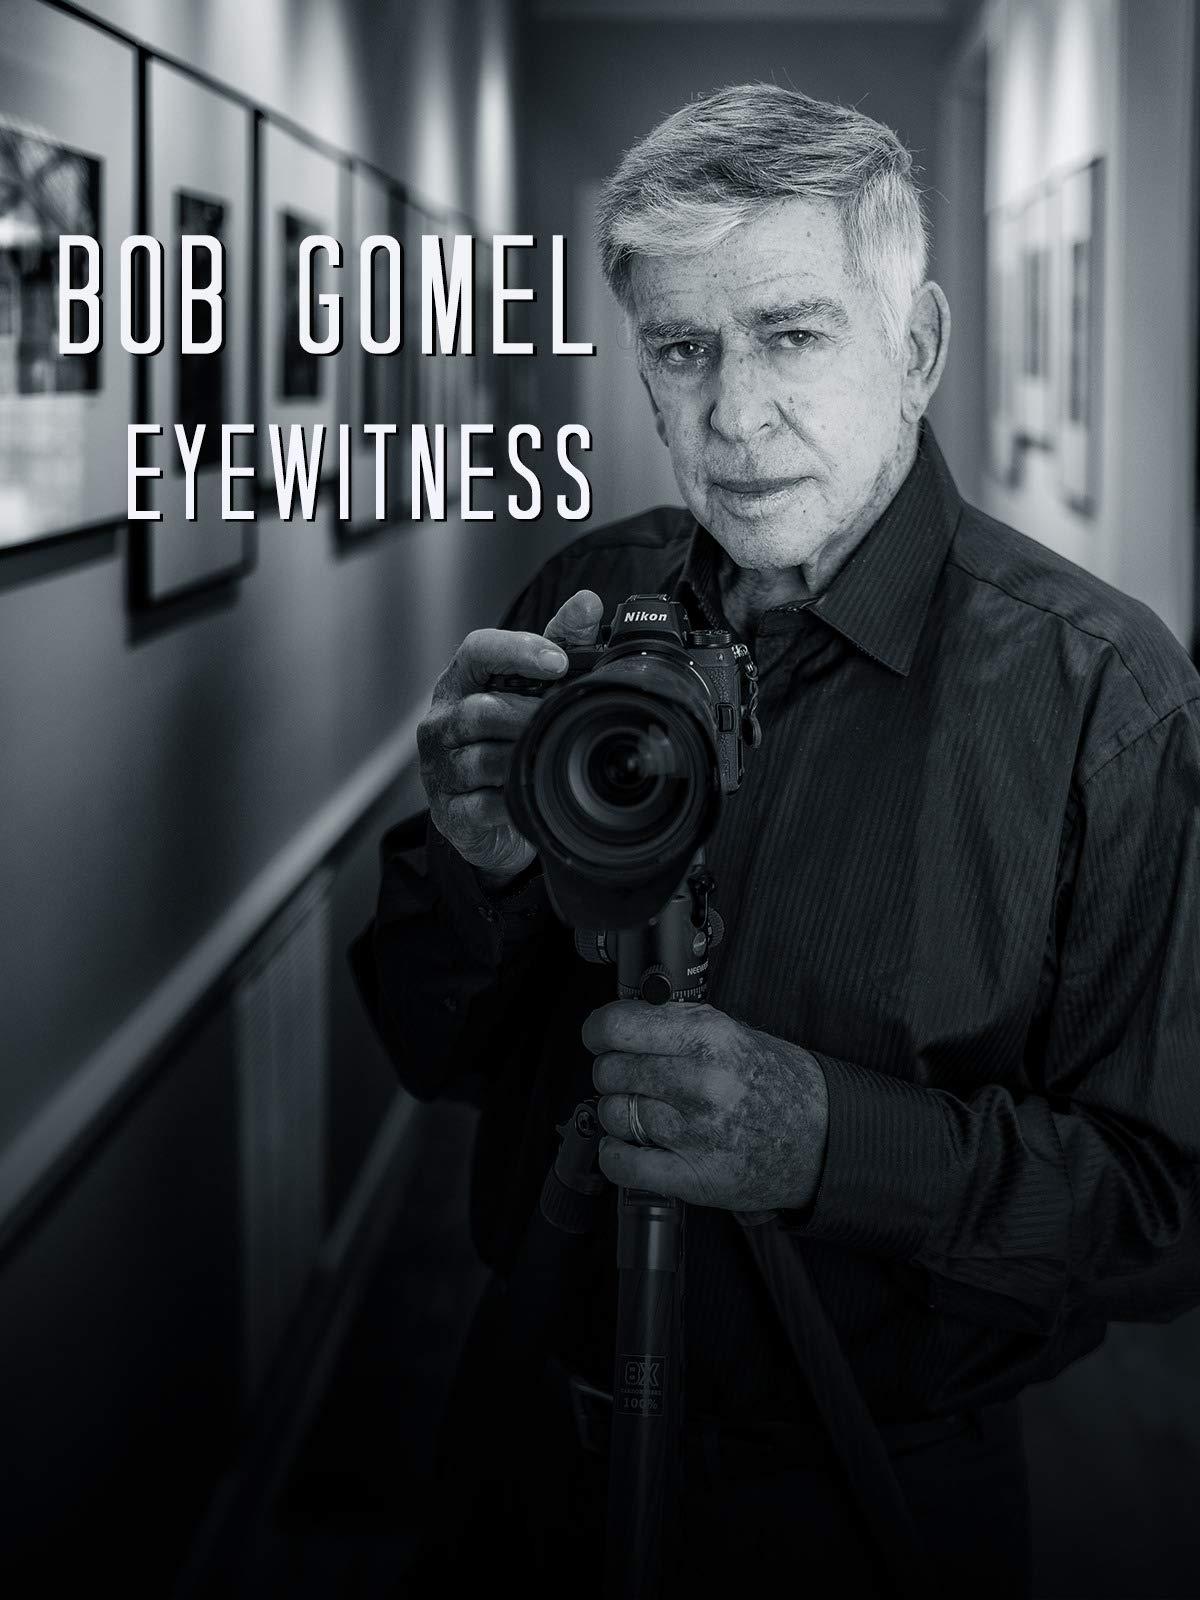 Bob Gomel : Eyewitness